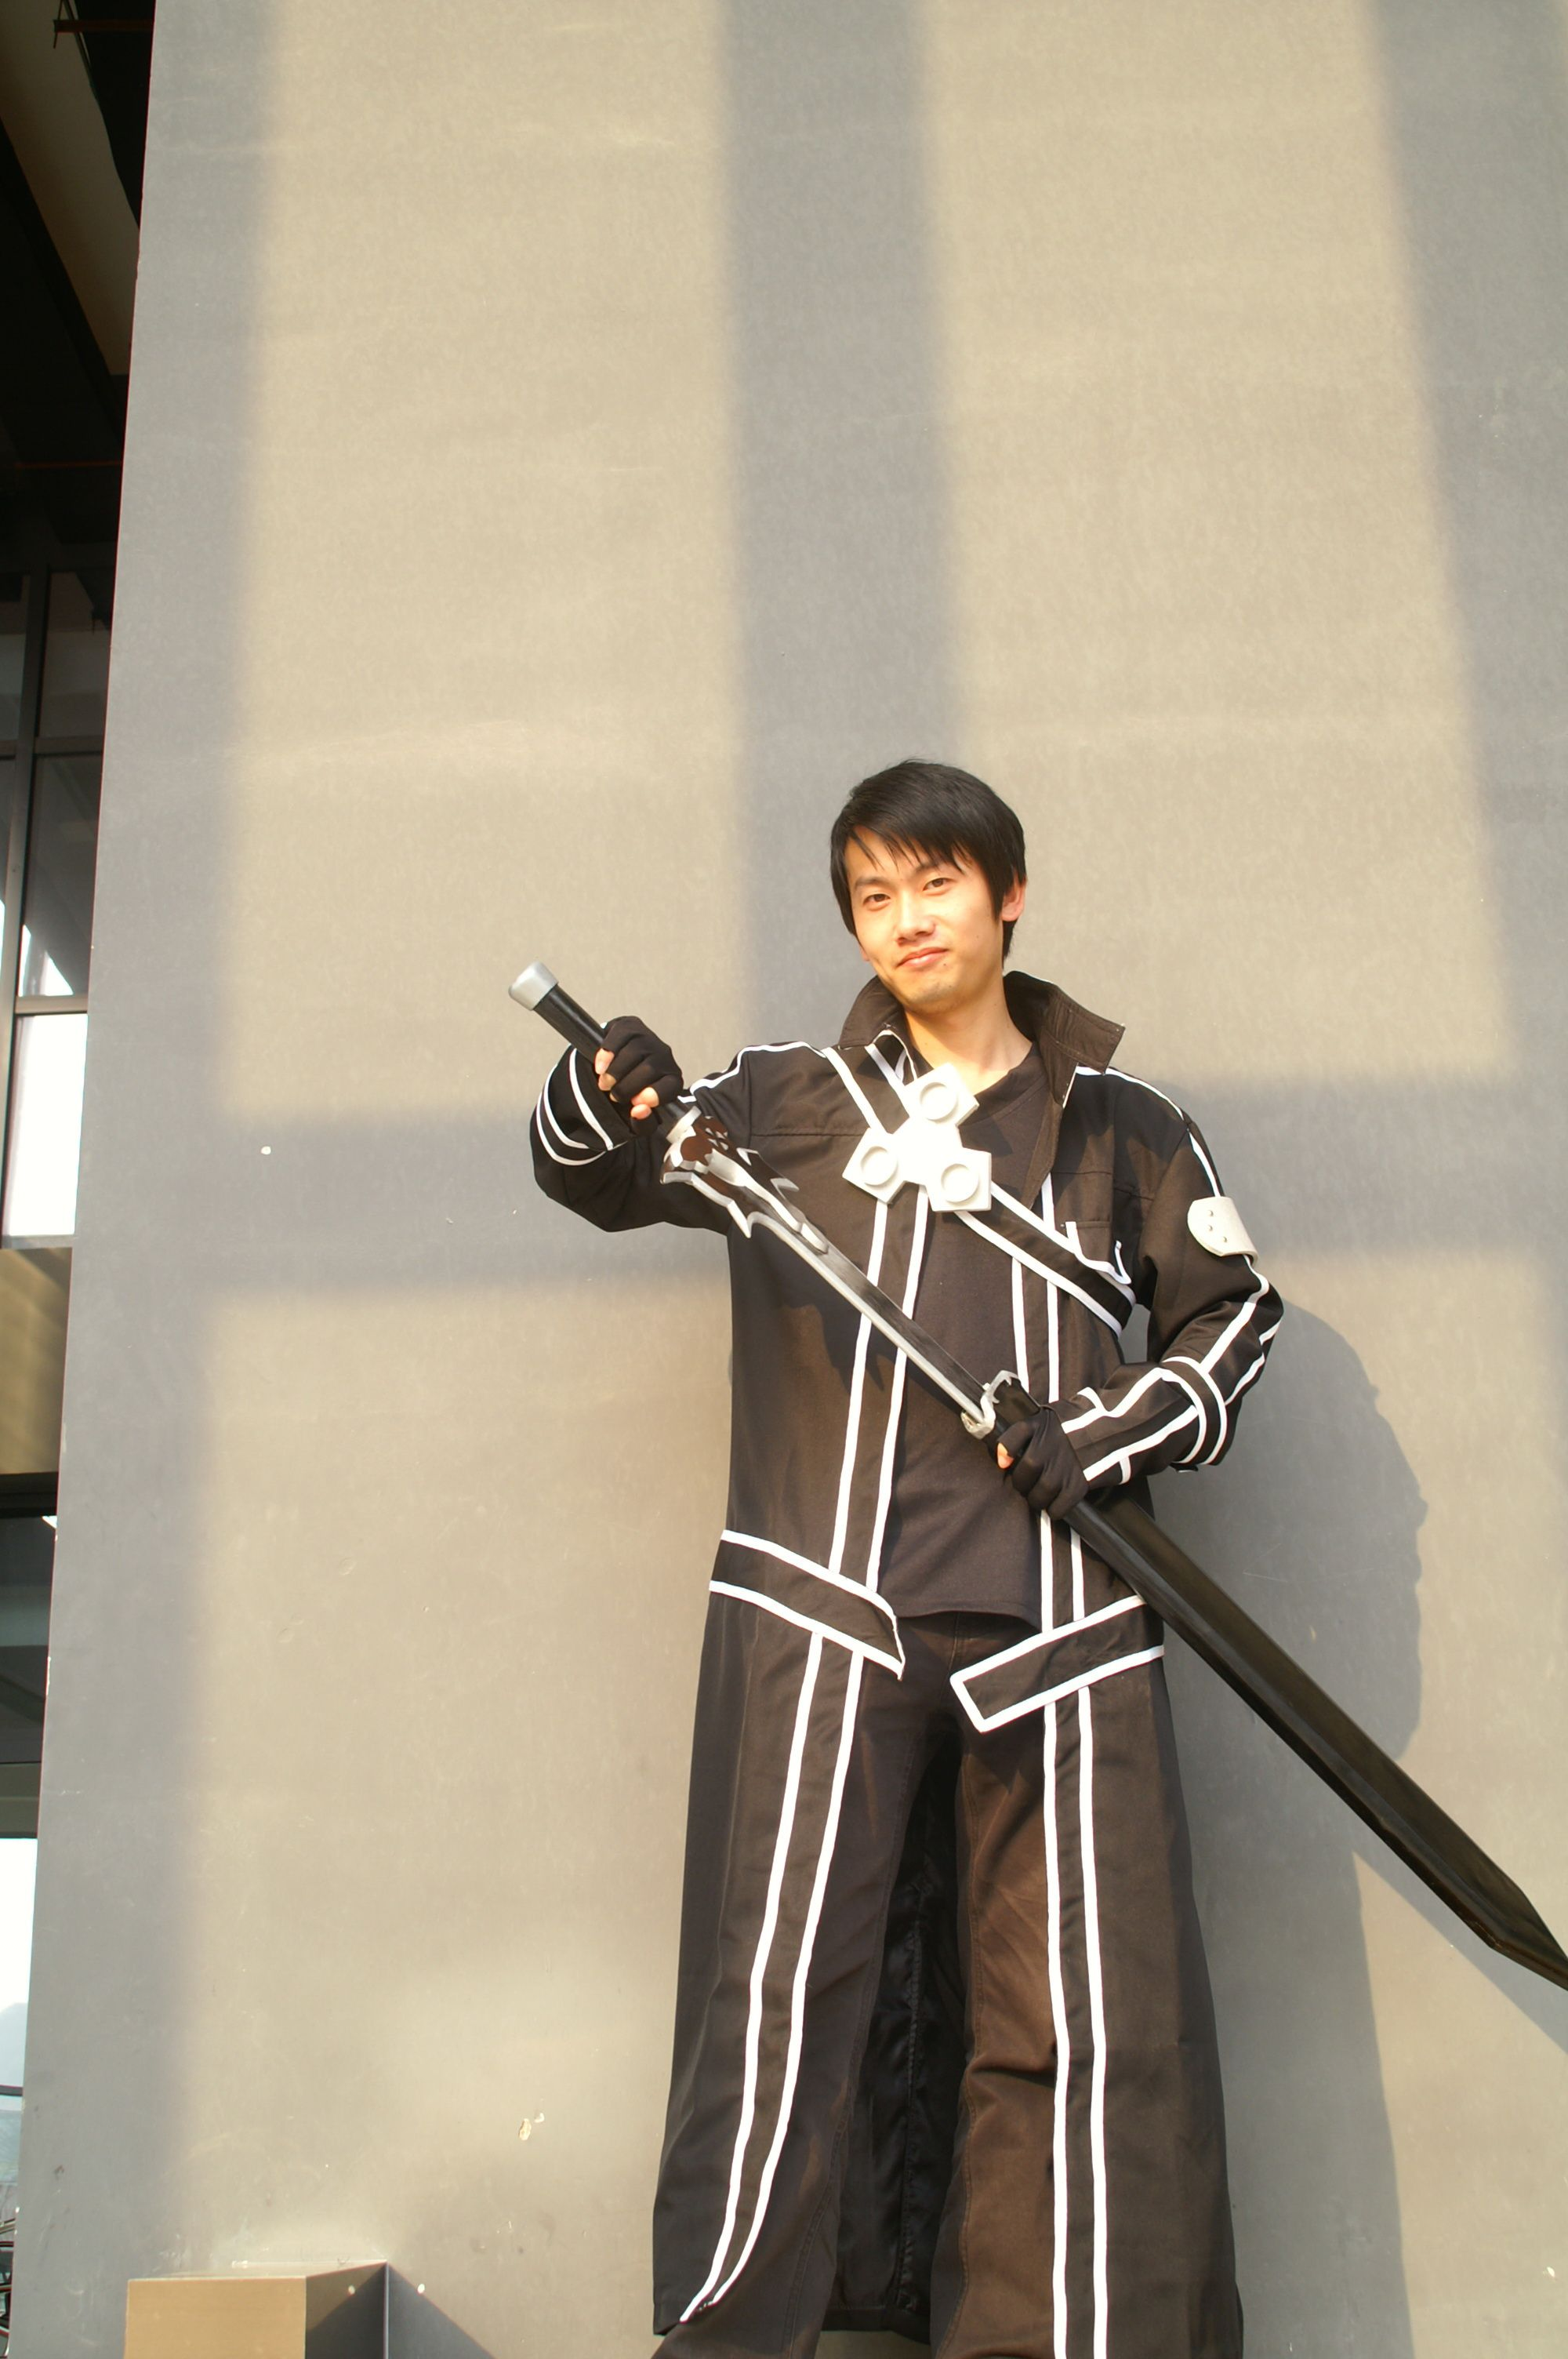 Sword Art Online Kirito Cosplay | FAIL cosplay | Pinterest ...